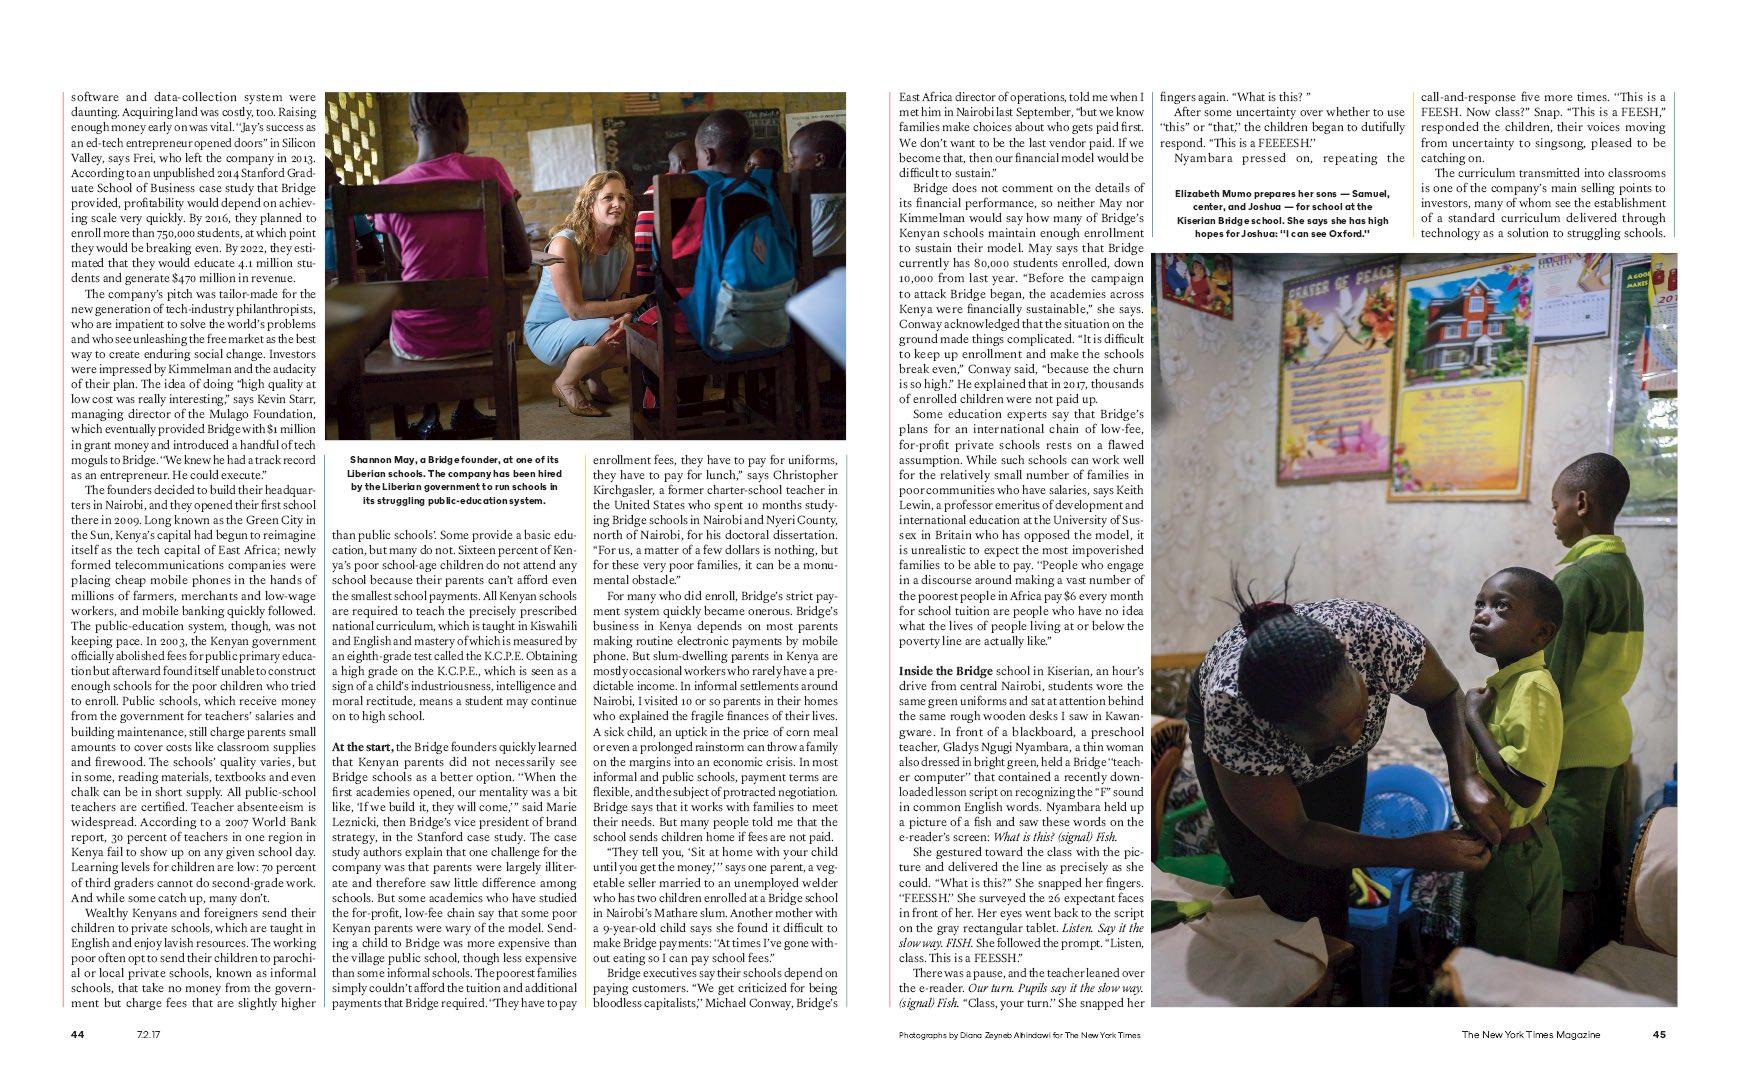 Diana Zeyneb Alhindawi_2017_07_02_New York Times Magazine_page 44 45_bridge education africa s.jpg